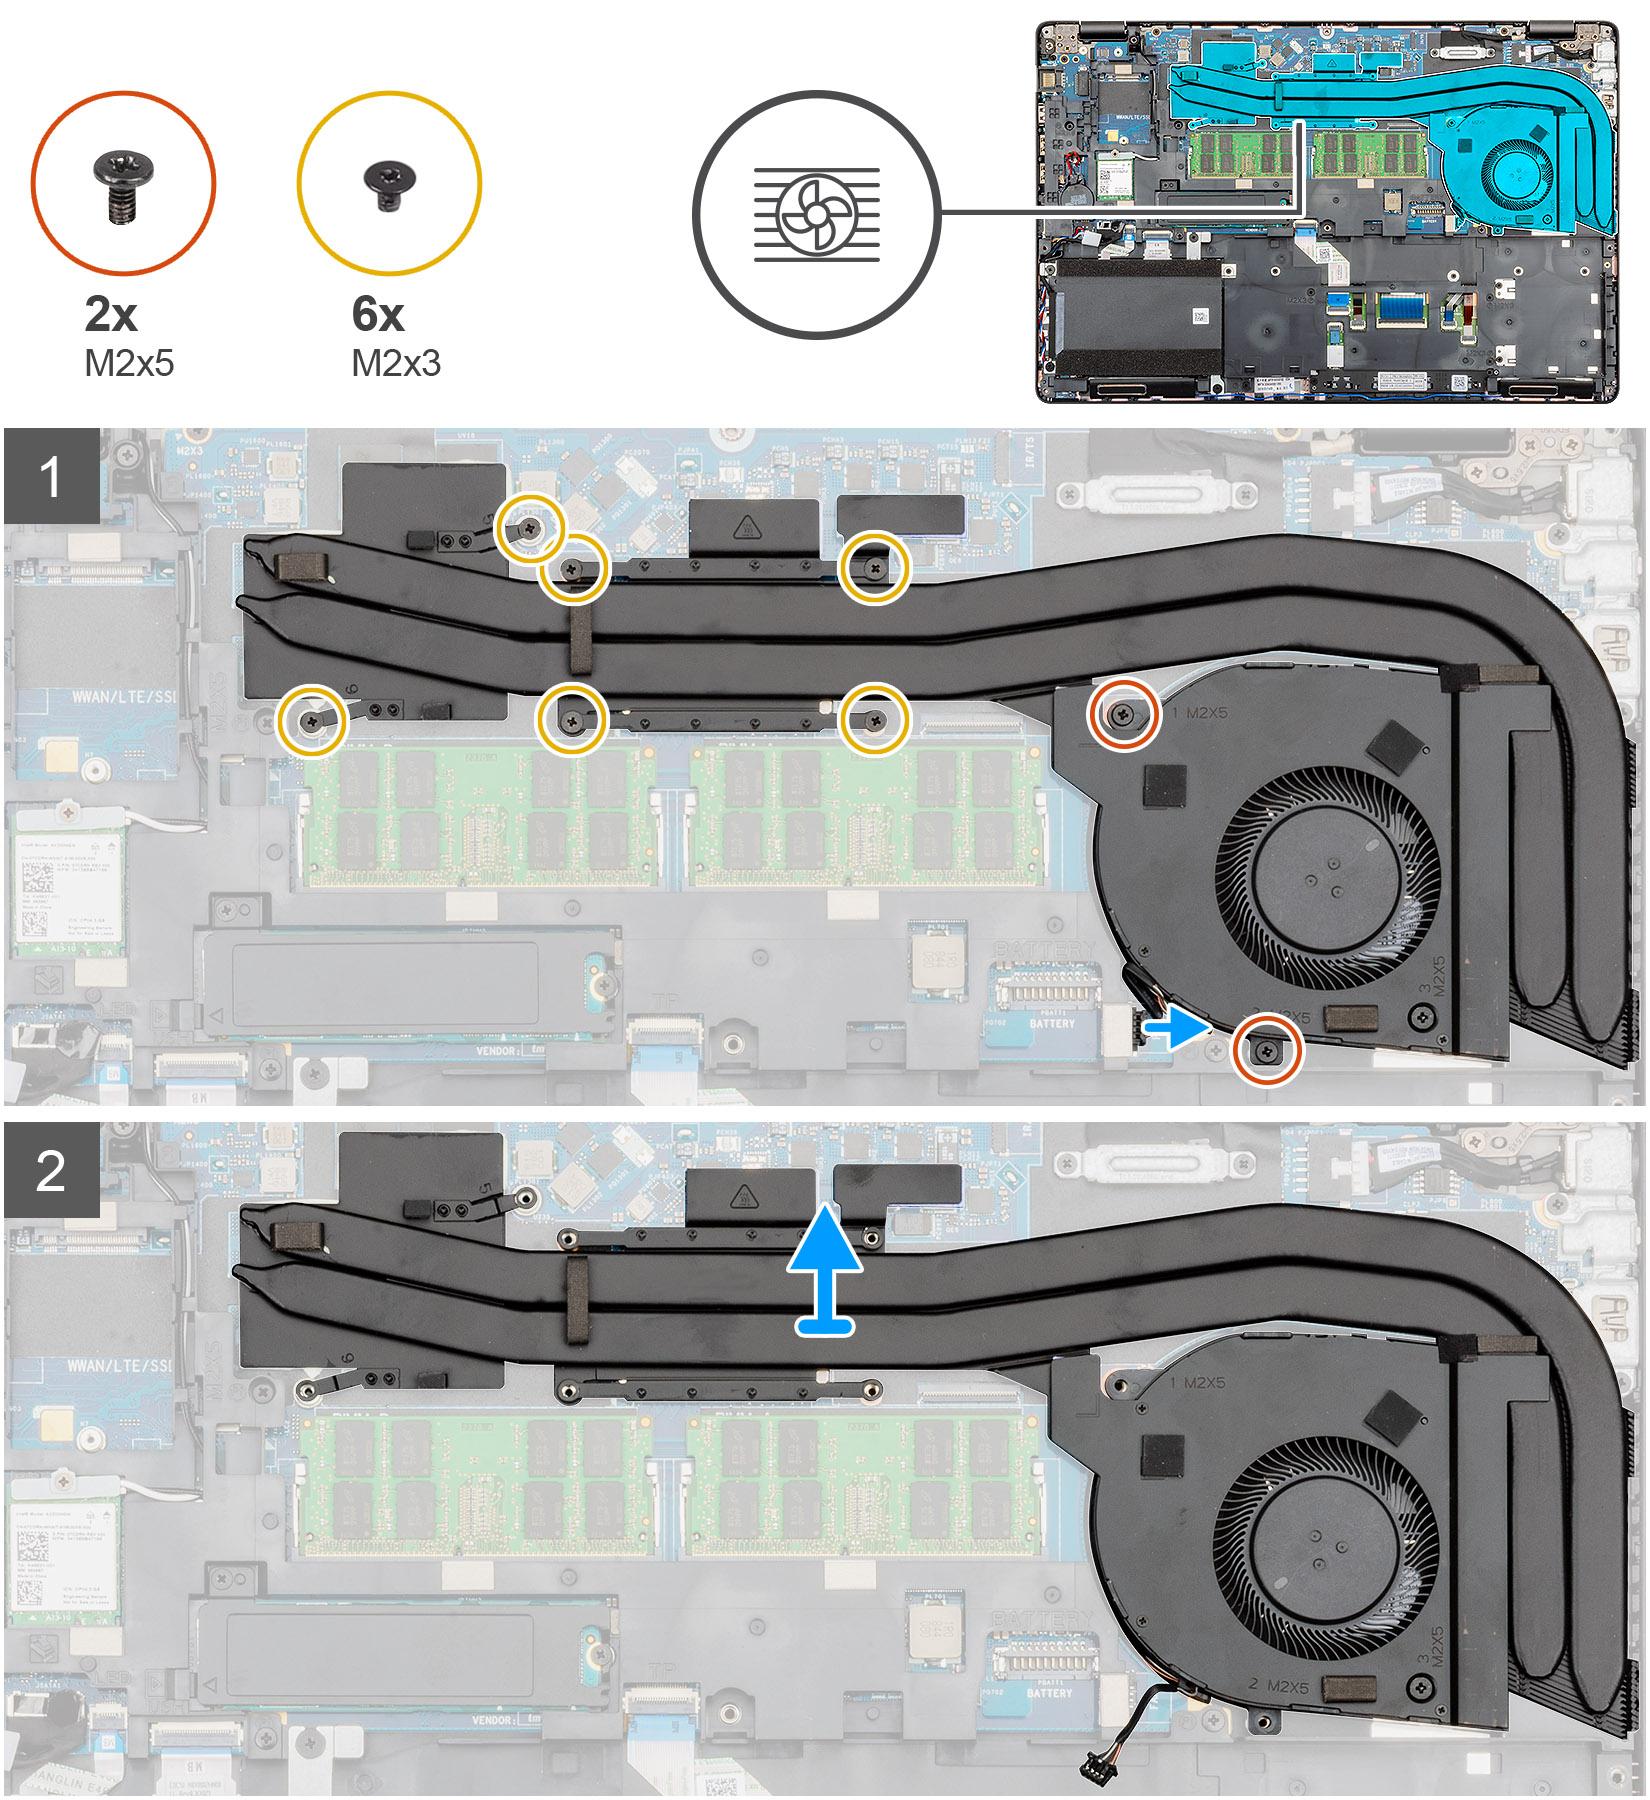 Removing the Heatsink-discrete